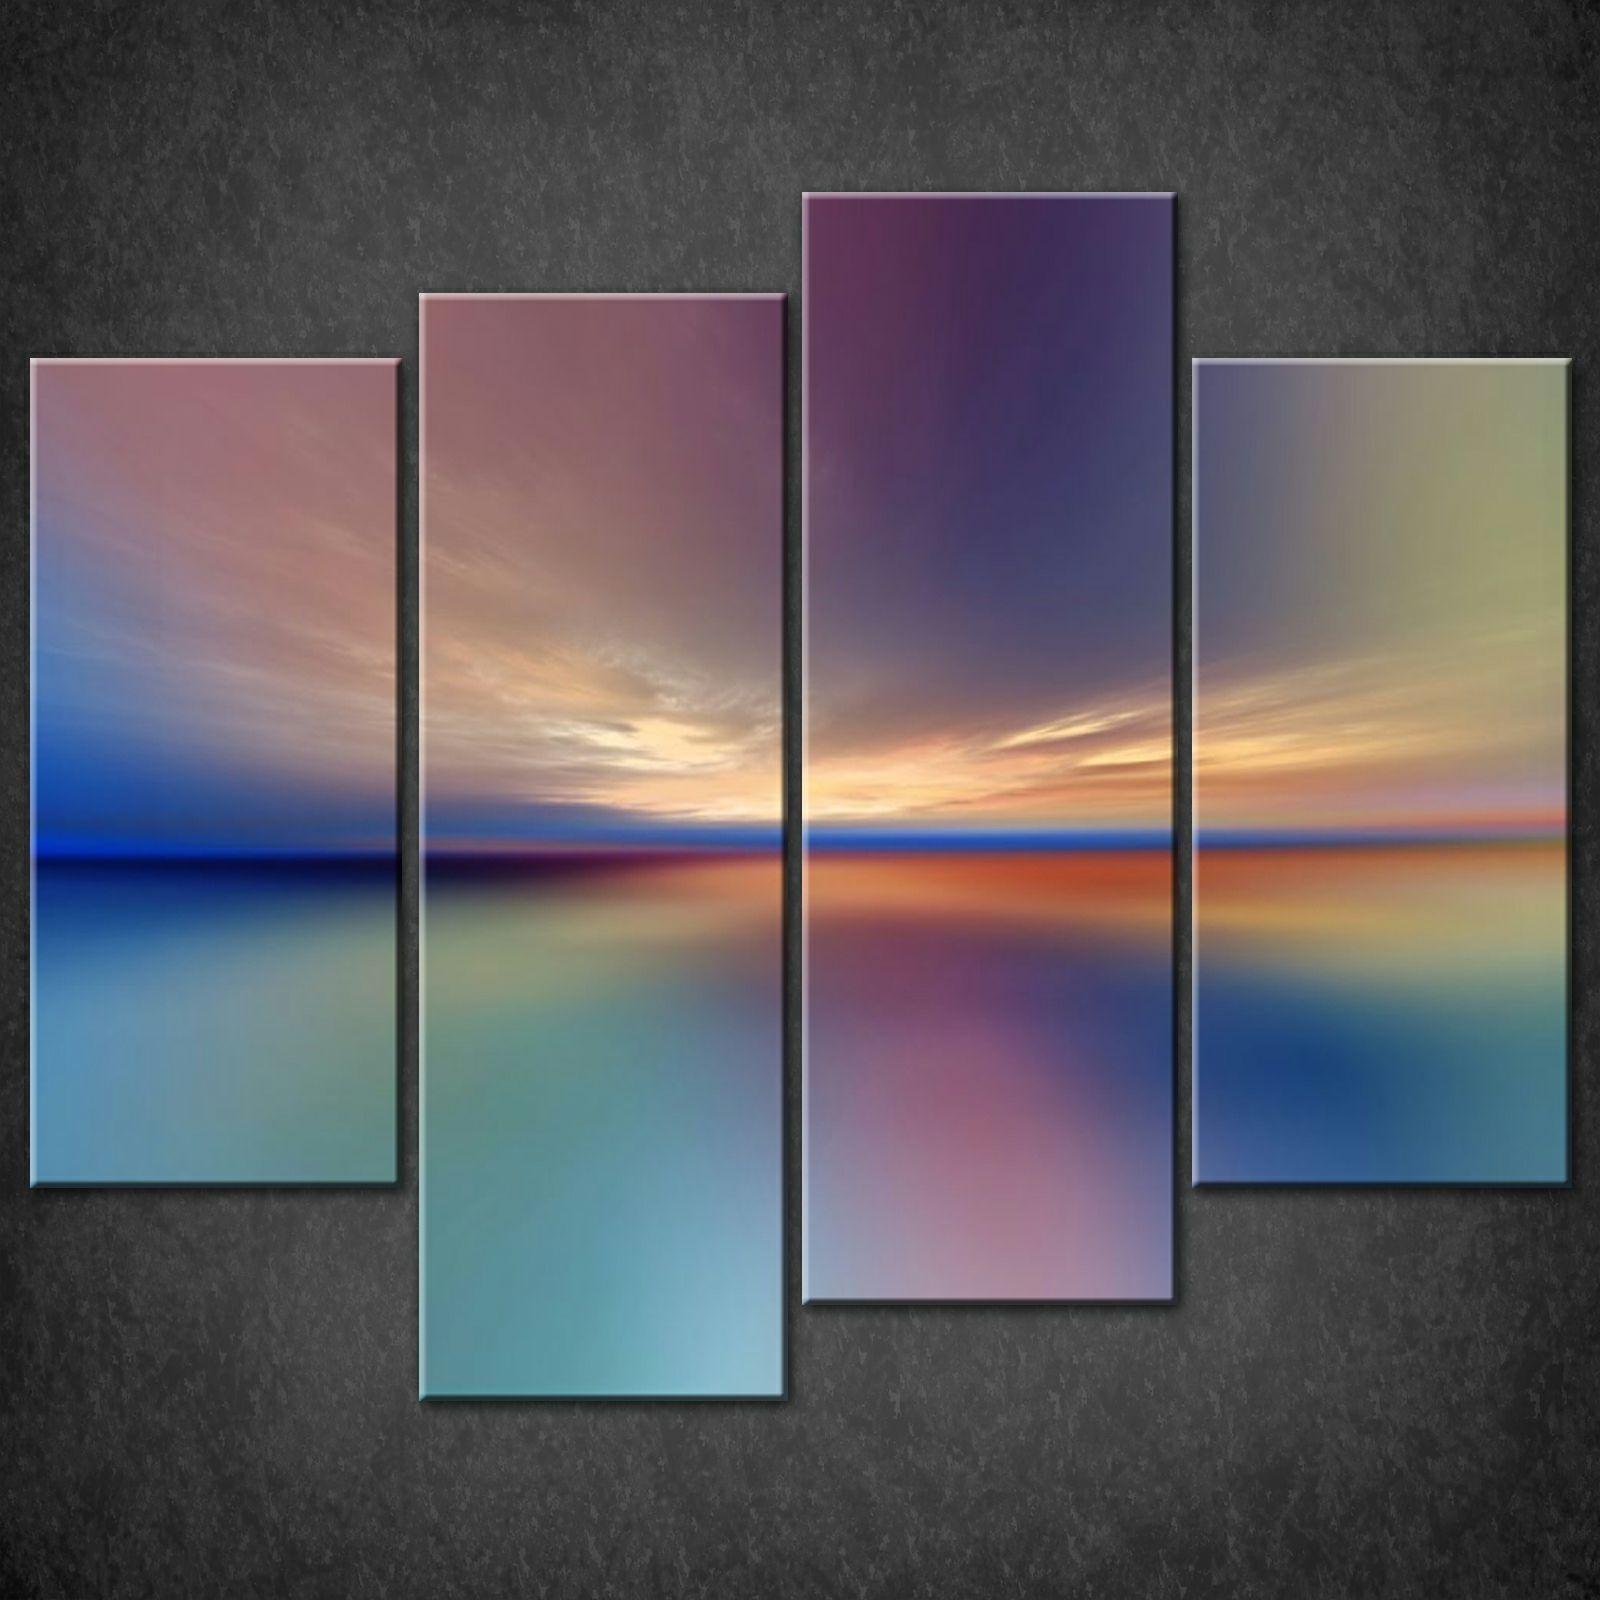 Abstract Sunset Split Canvas Wall Art Pictures Prints Larger Sizes regarding Split Wall Art